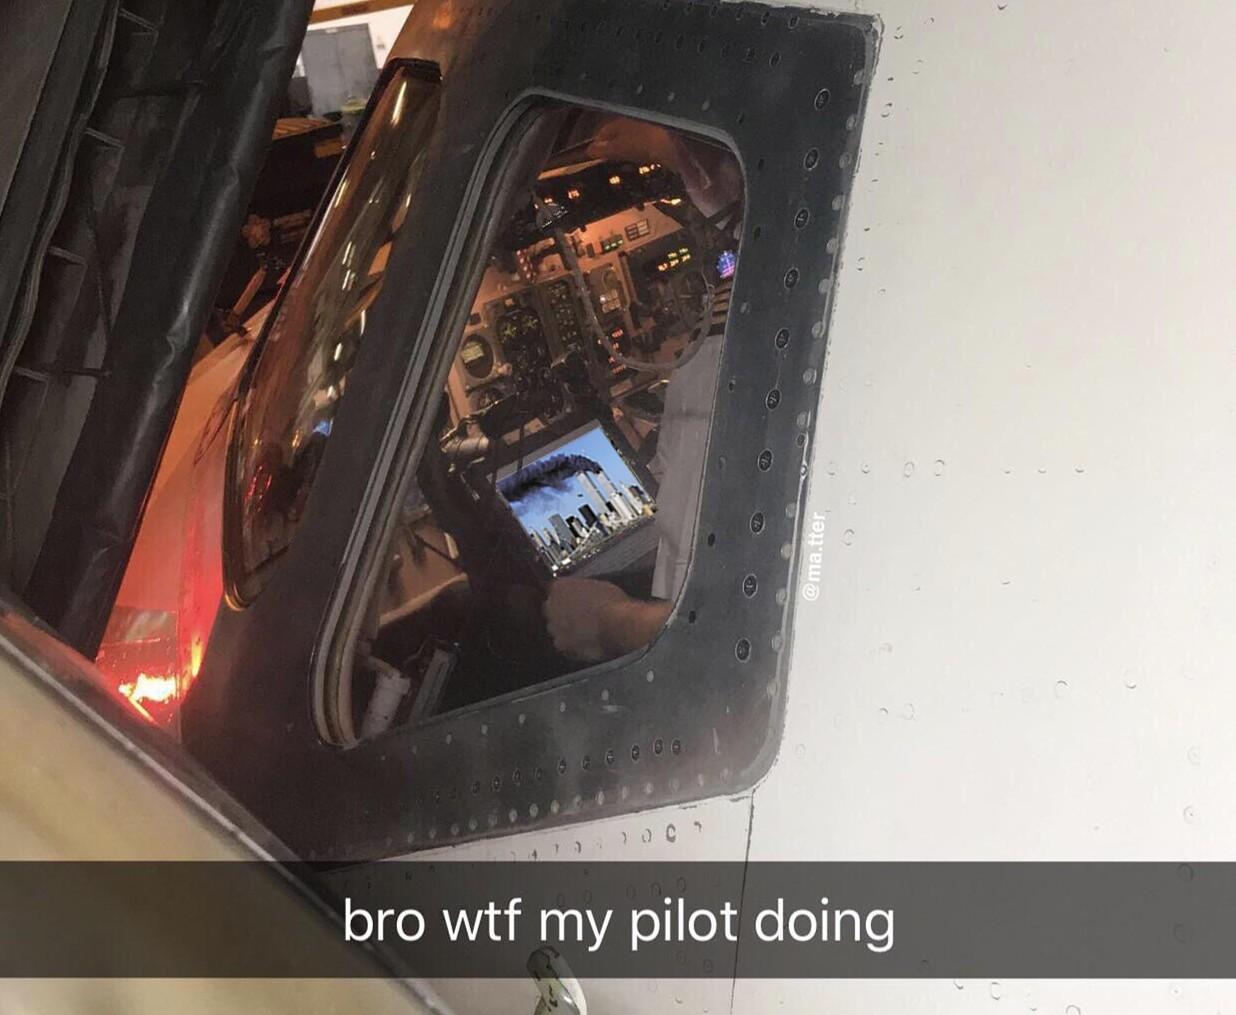 11 de setembro - meme